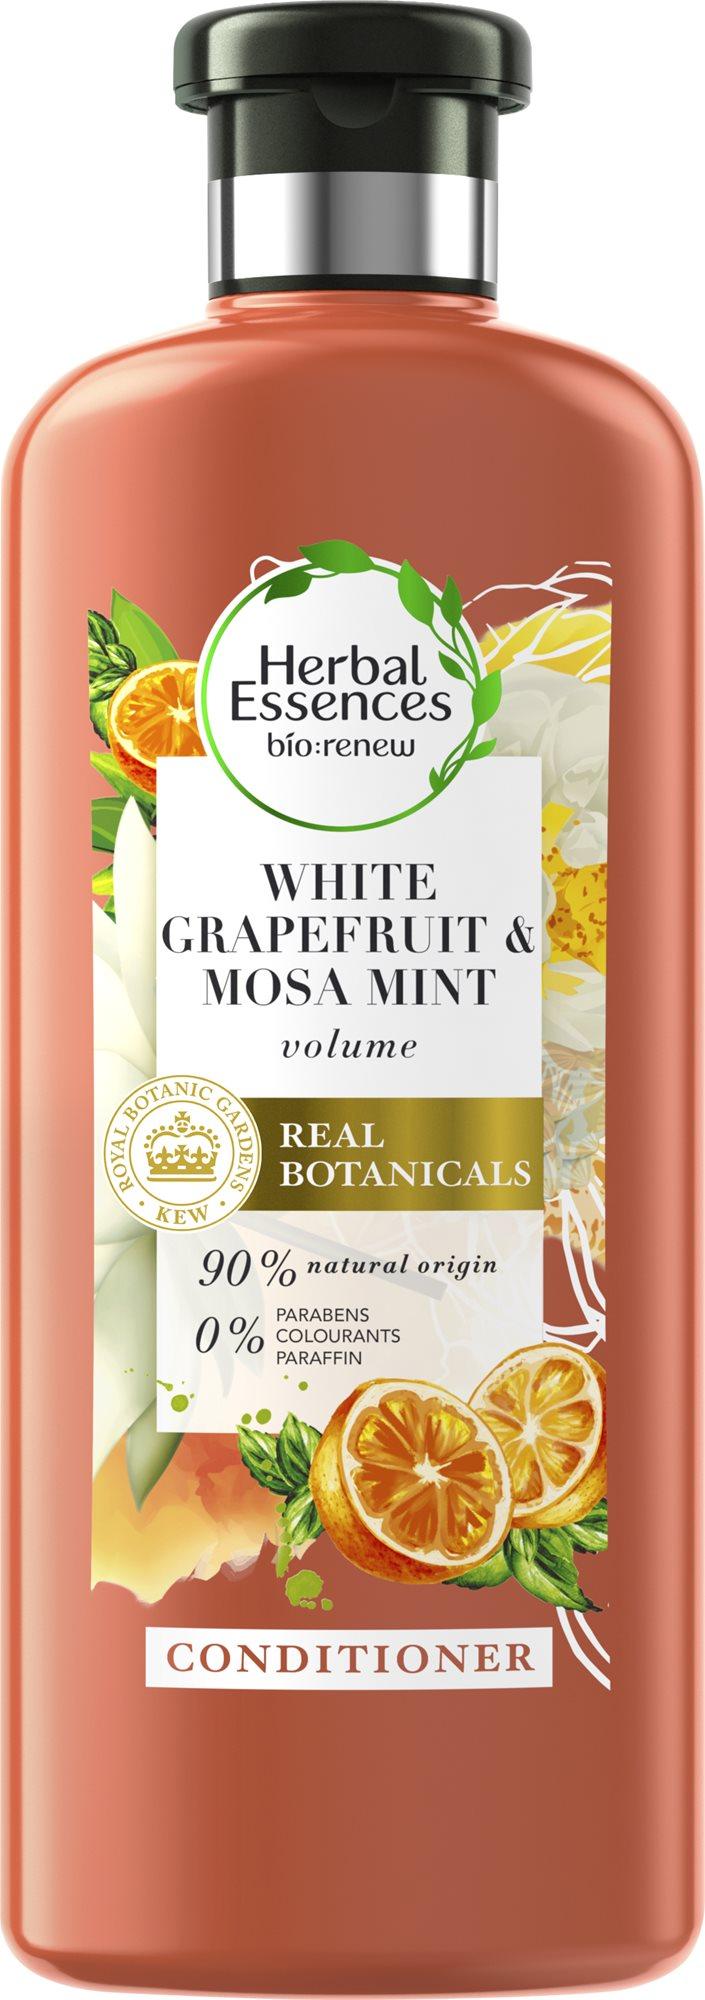 Herbal Essence Grapefruit and Mosa Mint 360 ml